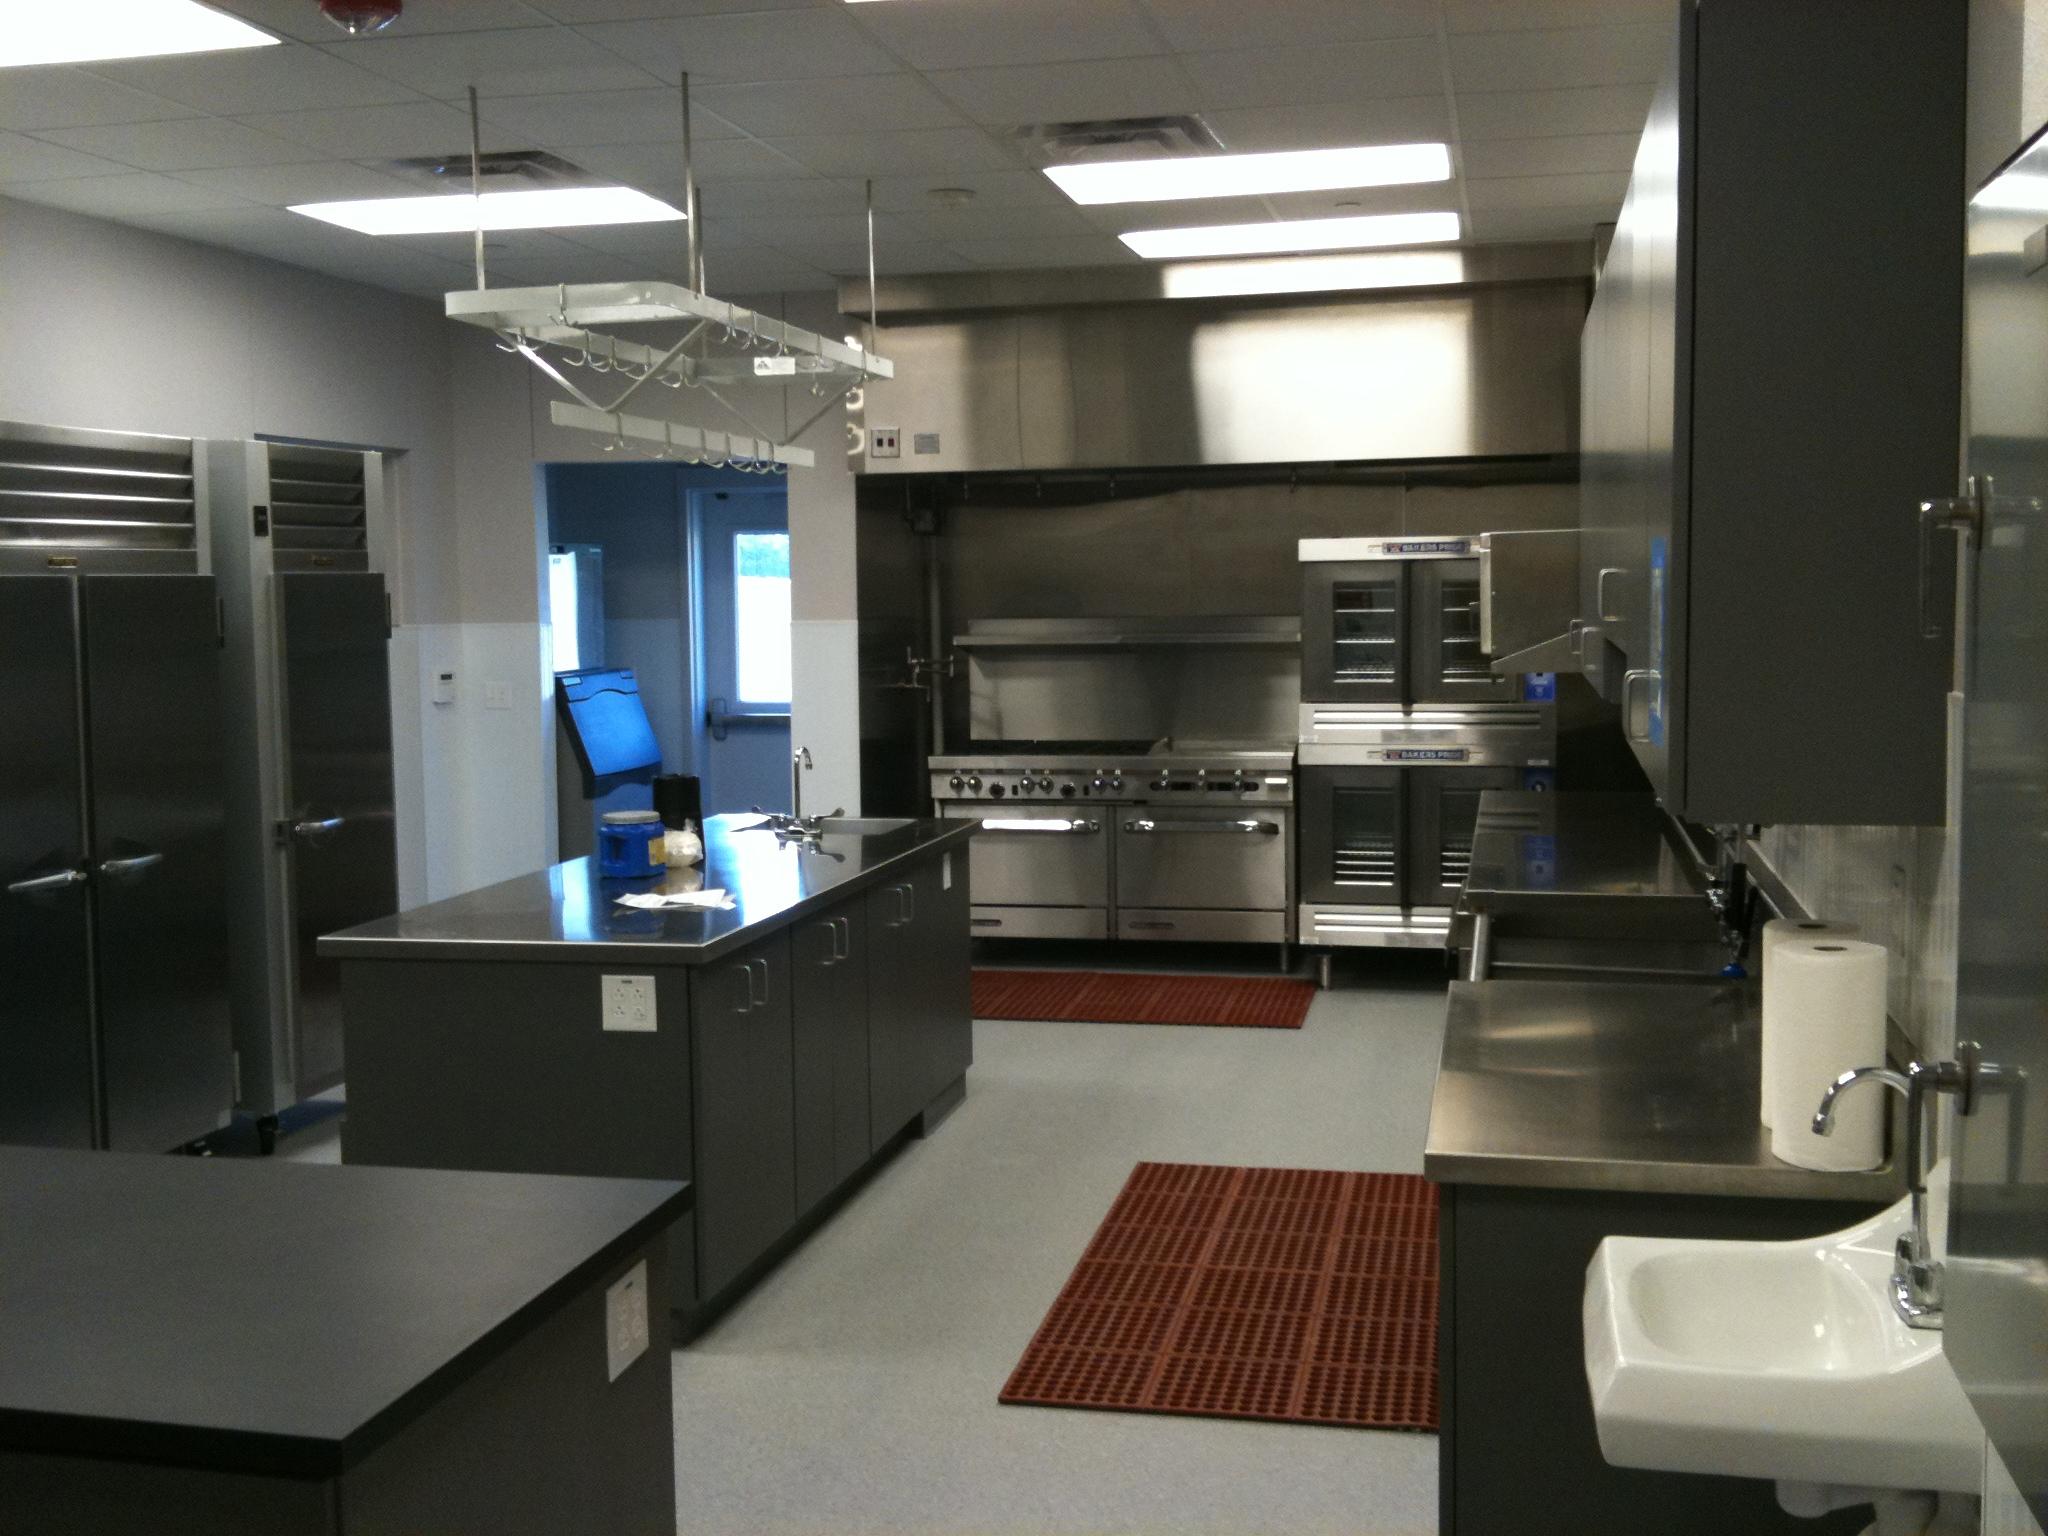 catering kitchen layout design.  Designing Church Kitchens Part 1